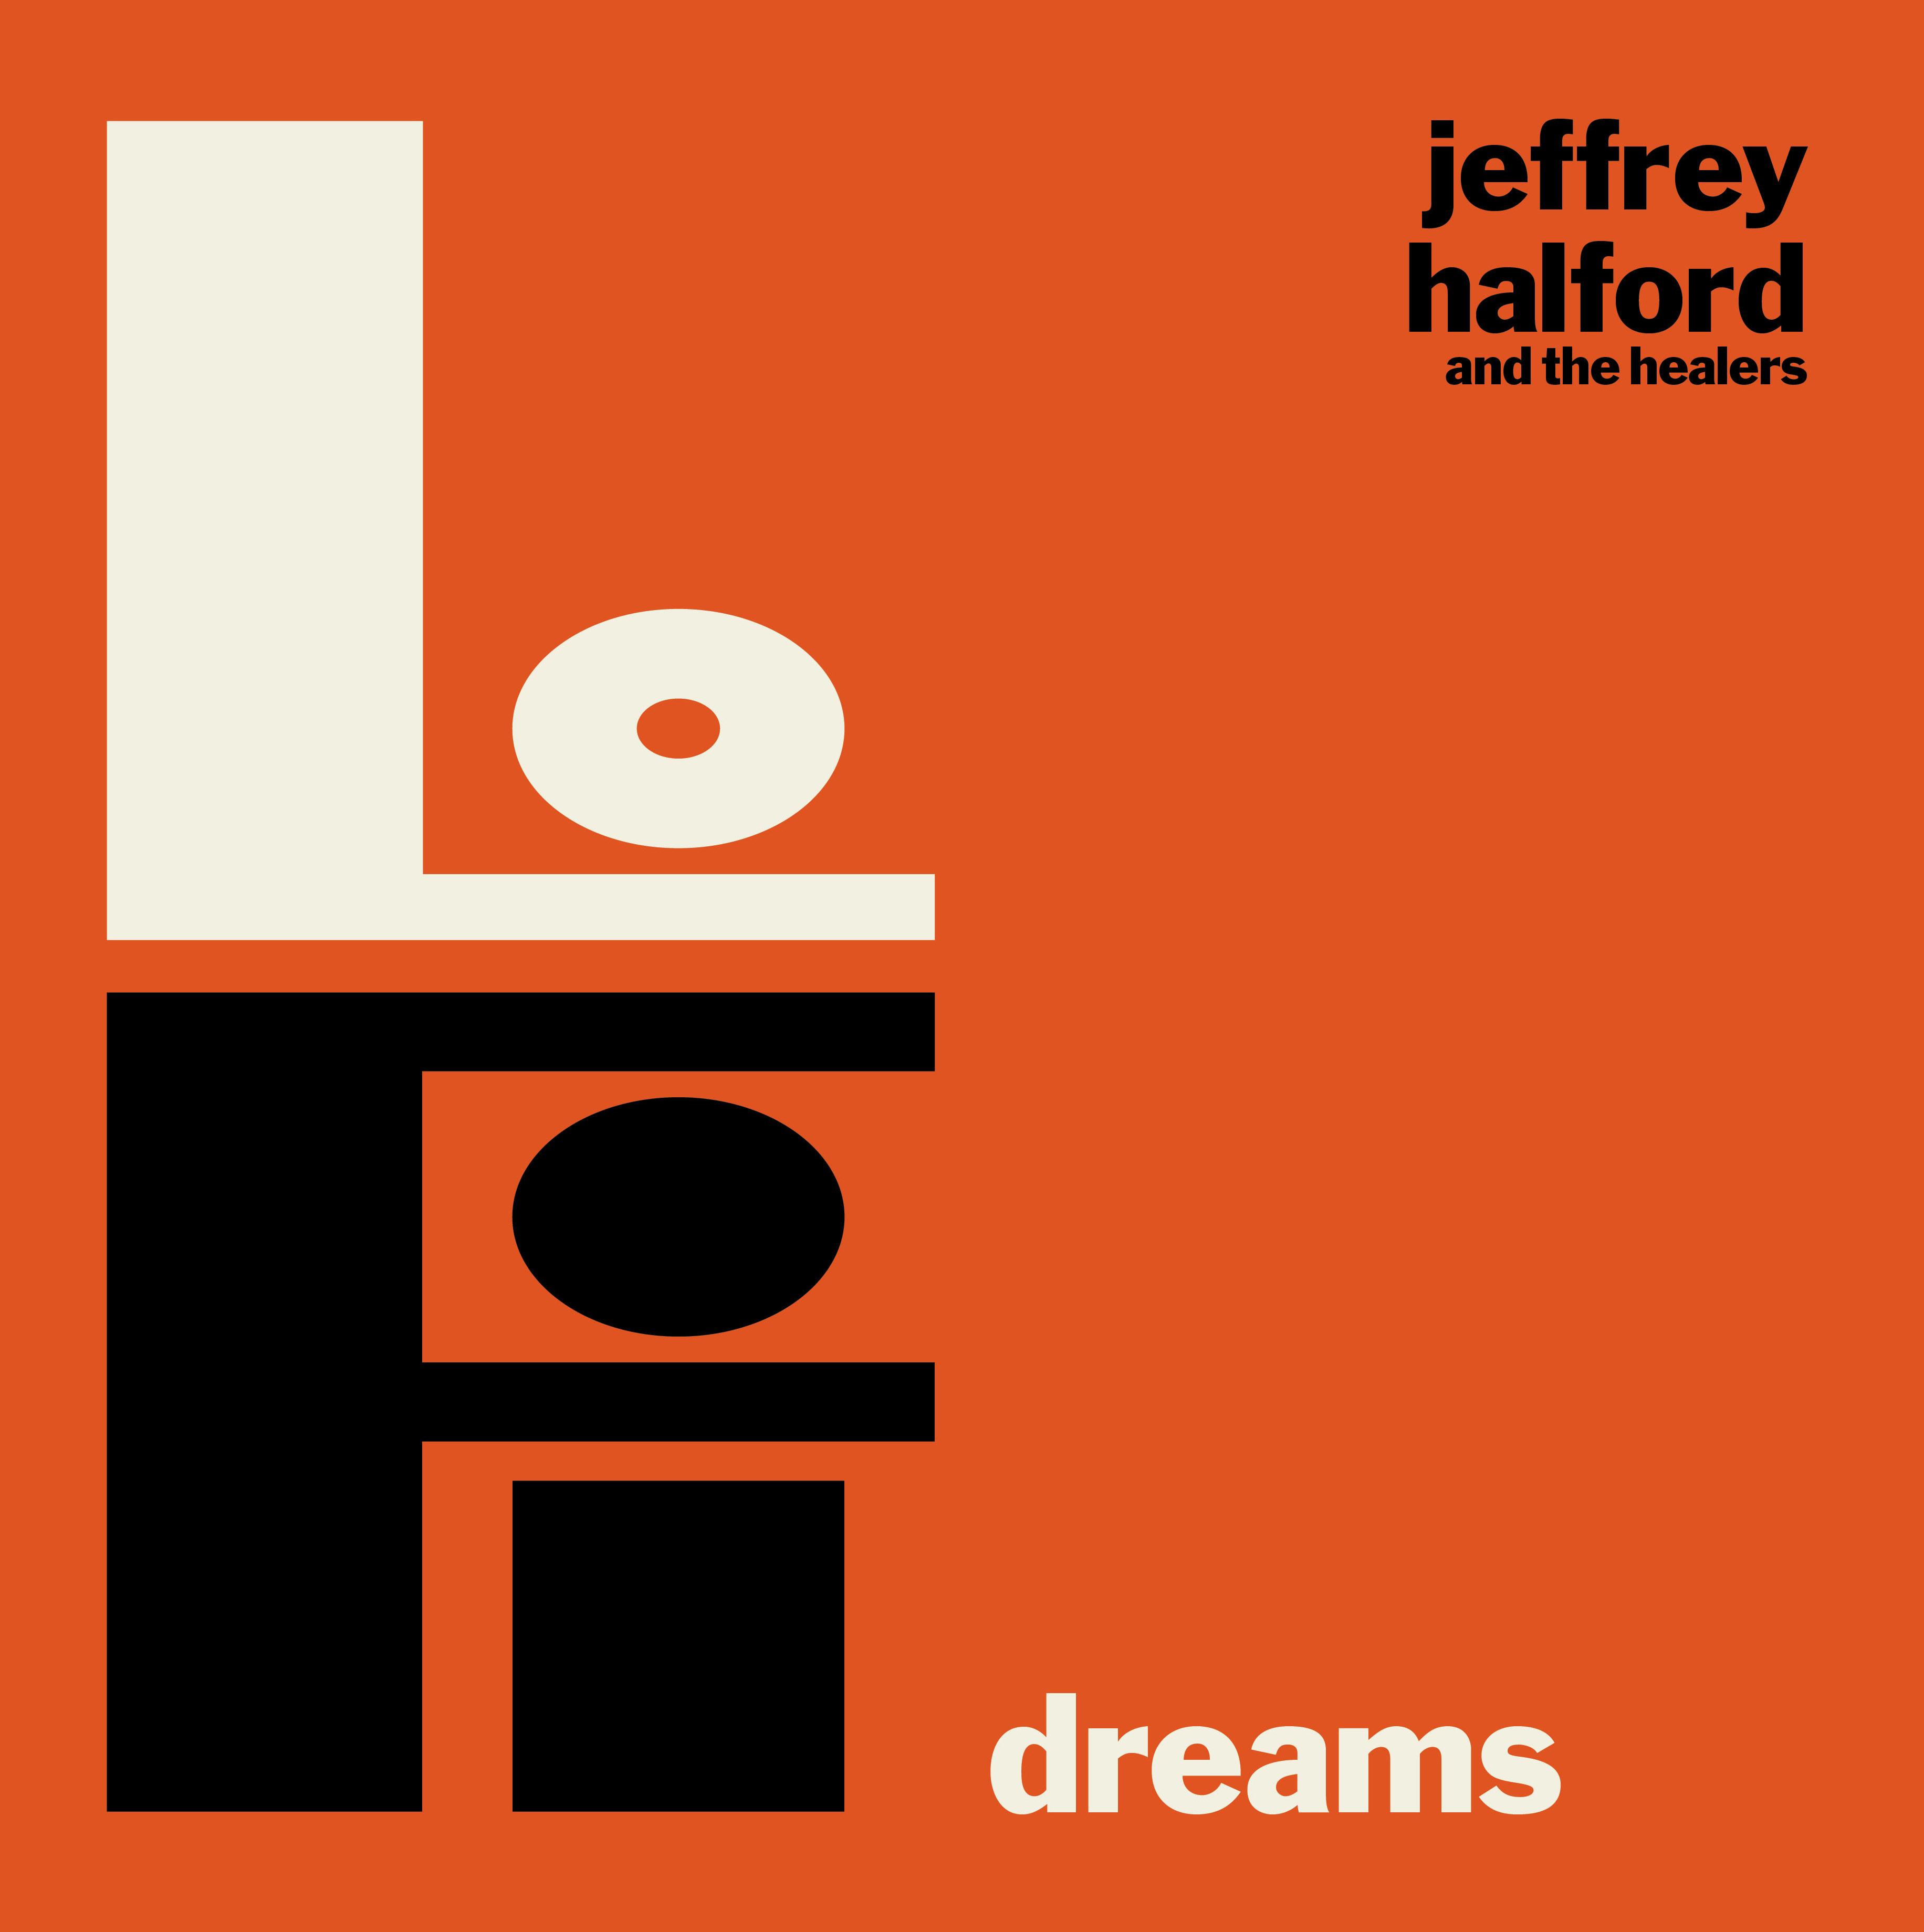 JEFFREY HALFORD AND THE HEALERS low-fi dreams CD COVER HI RES